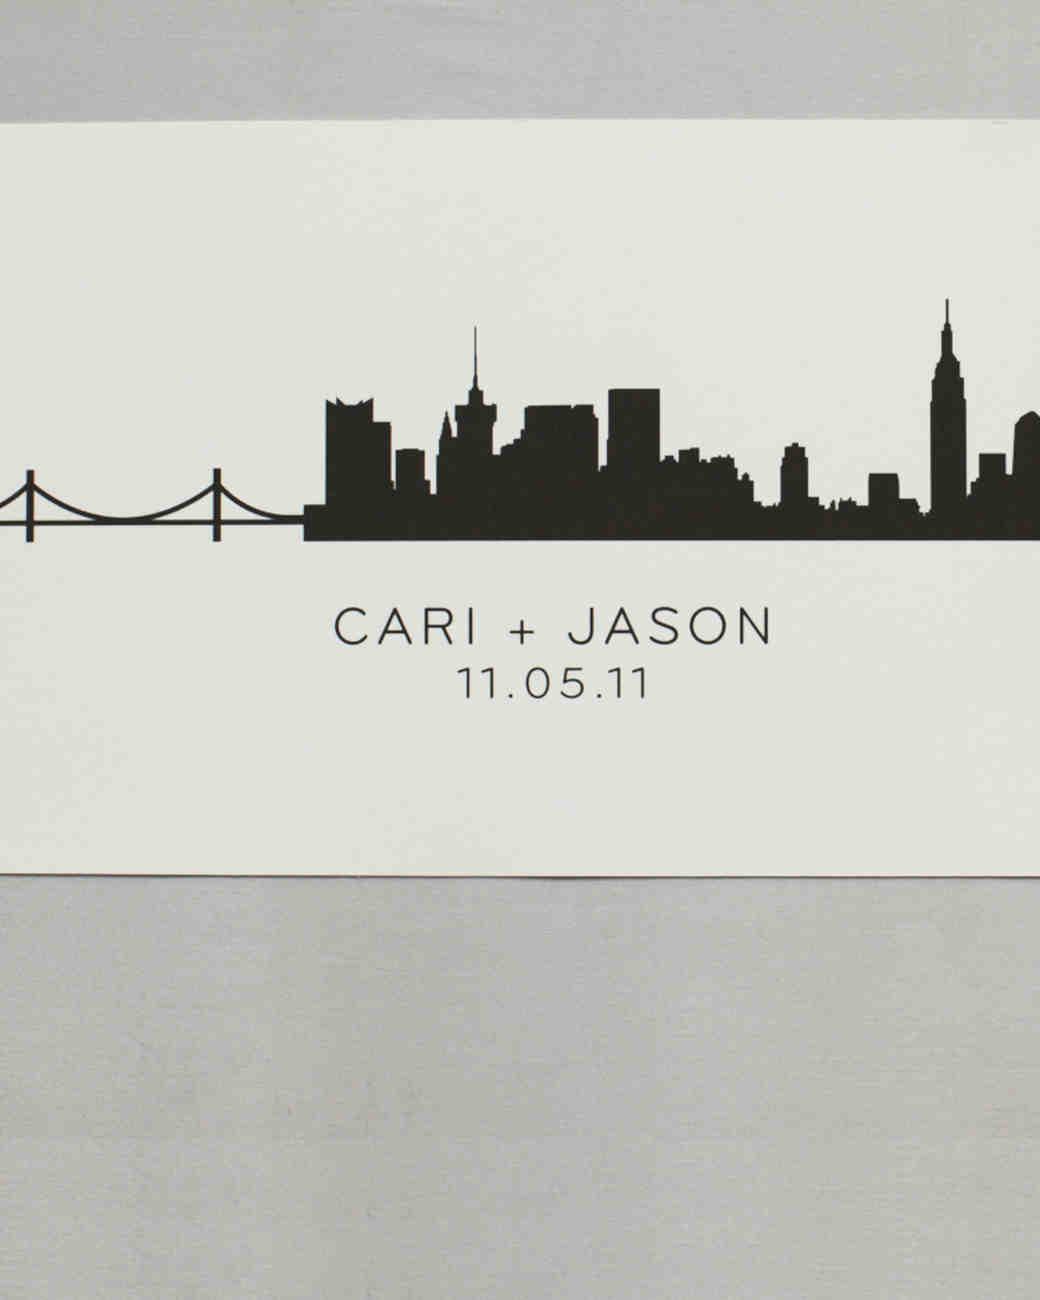 cari-jason-rw-wd108170-2.jpg